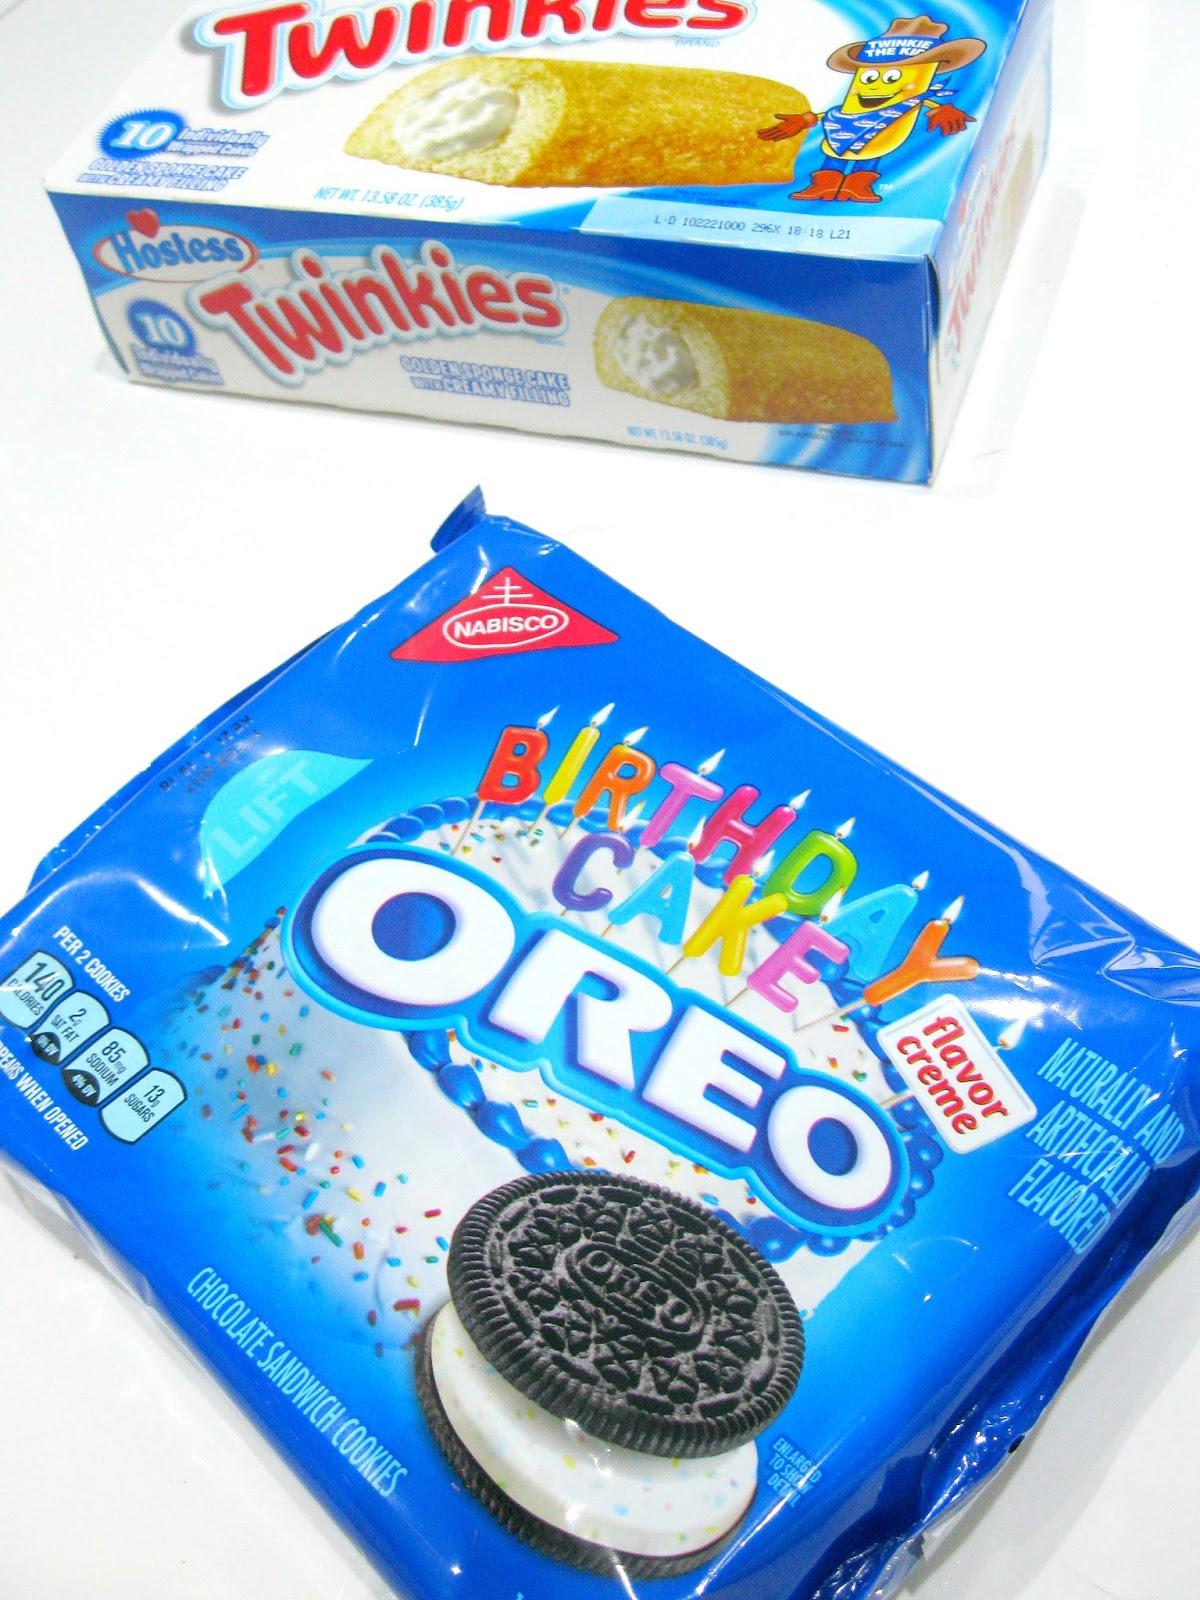 oreo birthday cake, oreo, american oreo, twinkies, twinkies uk